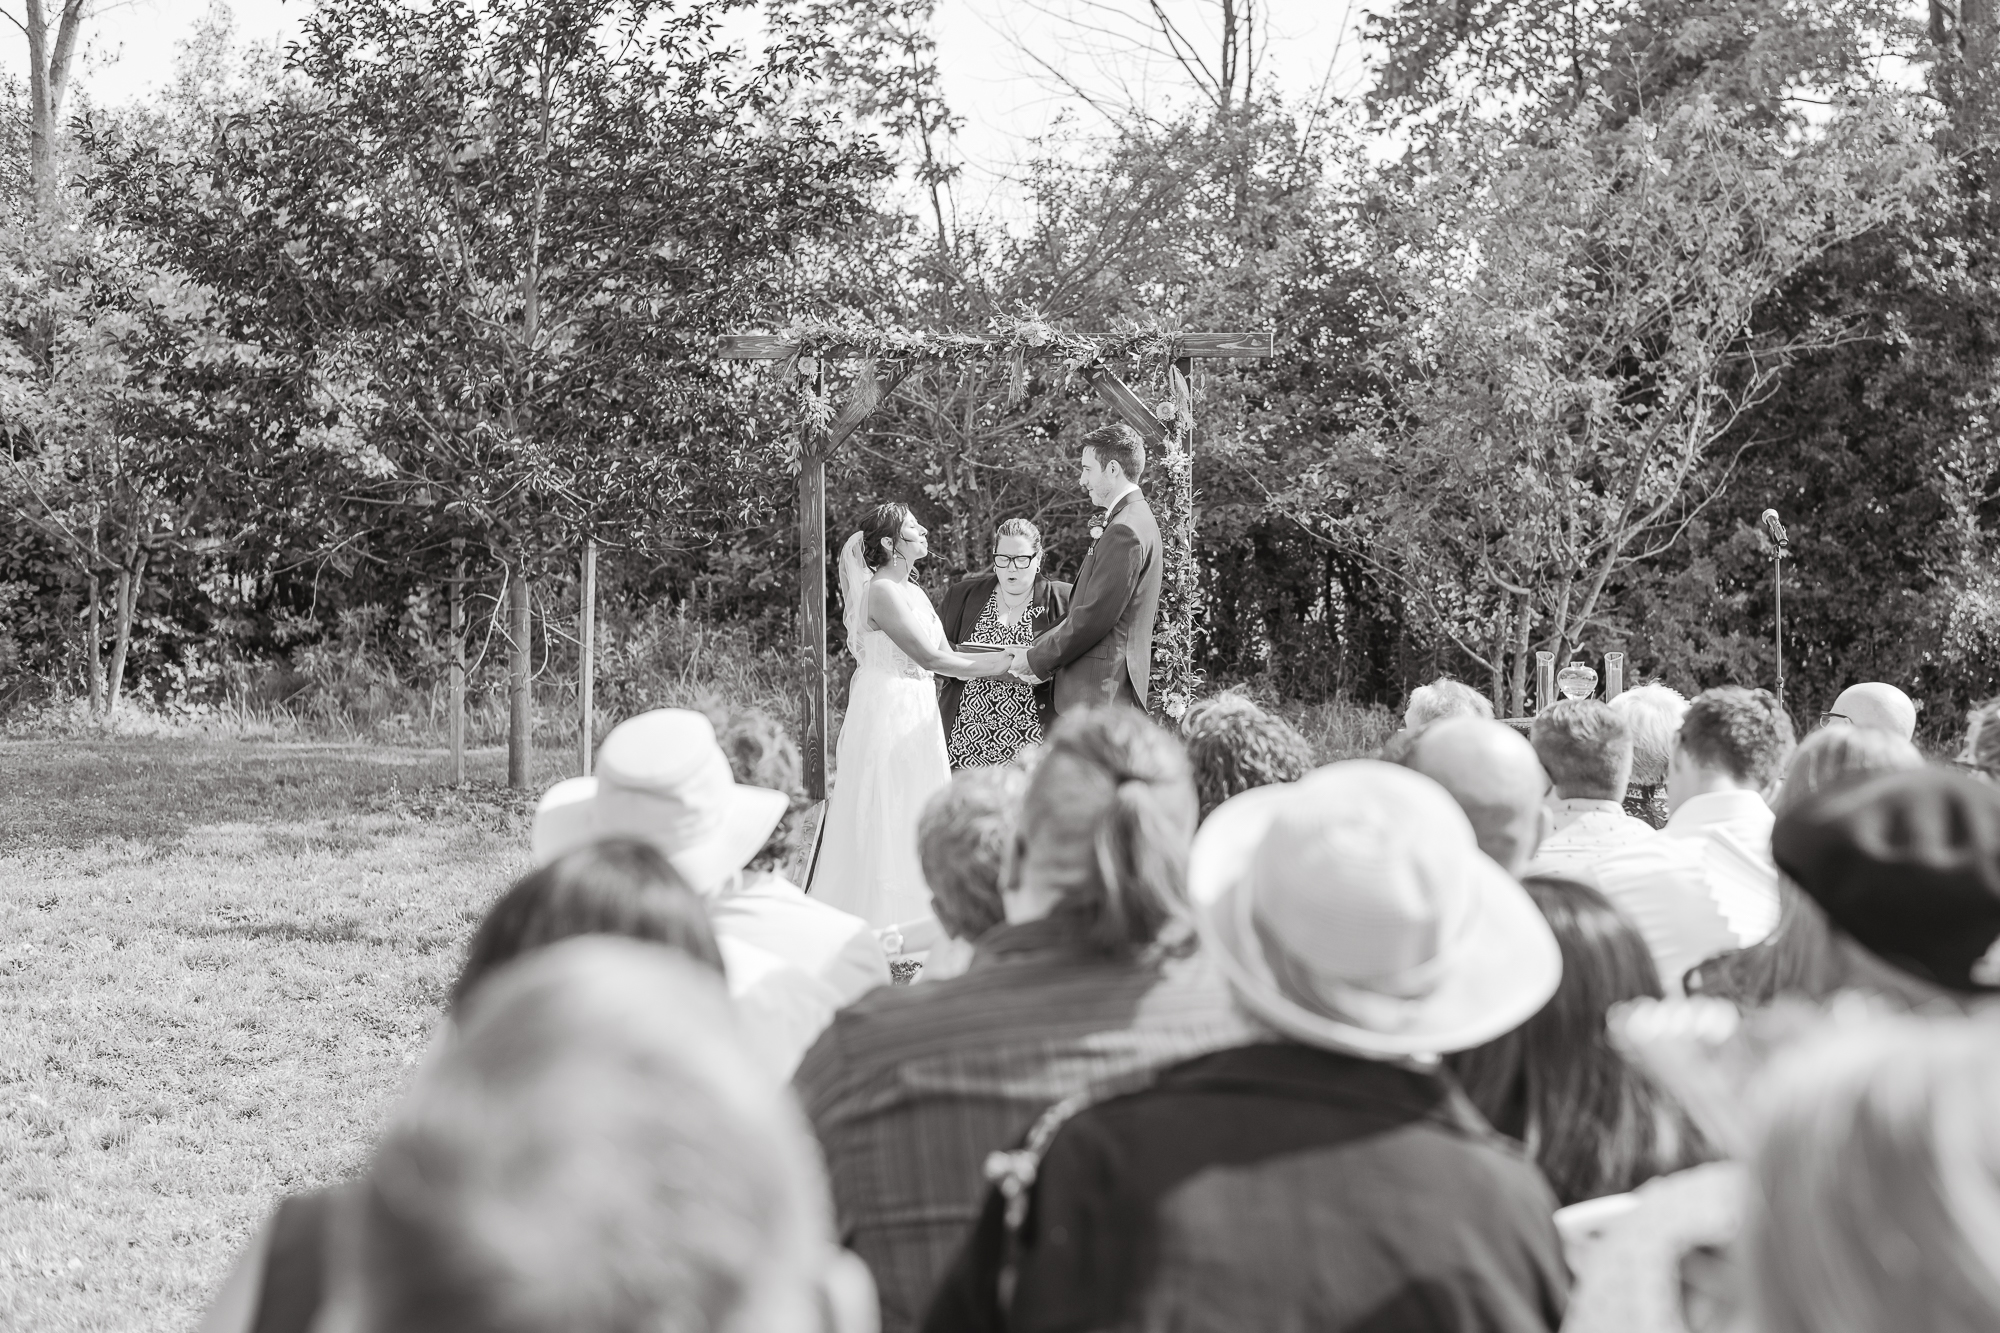 Maria+Adam_Summer Barn Wedding_The Barn at The North Star Preserve_Oberlin_Ohio-171.jpg